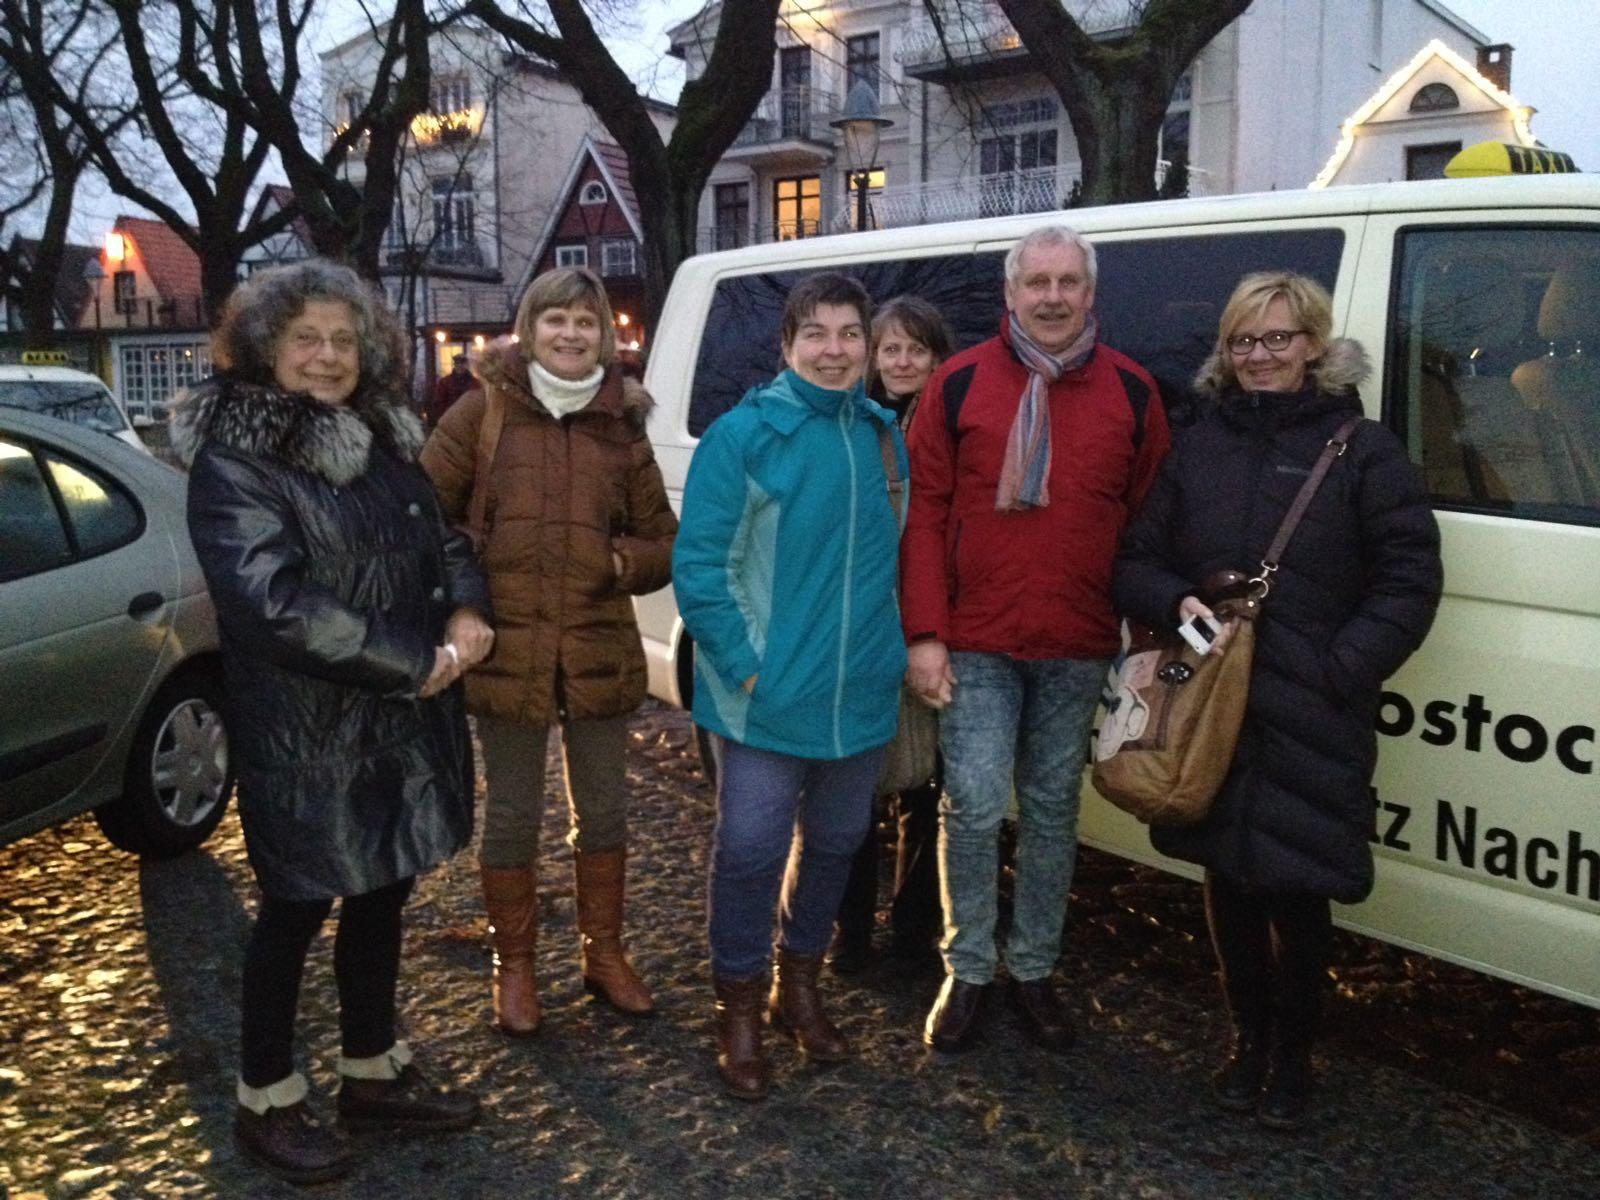 Taxi Rostock Ehrenamtler aus Greifswald Bild 1